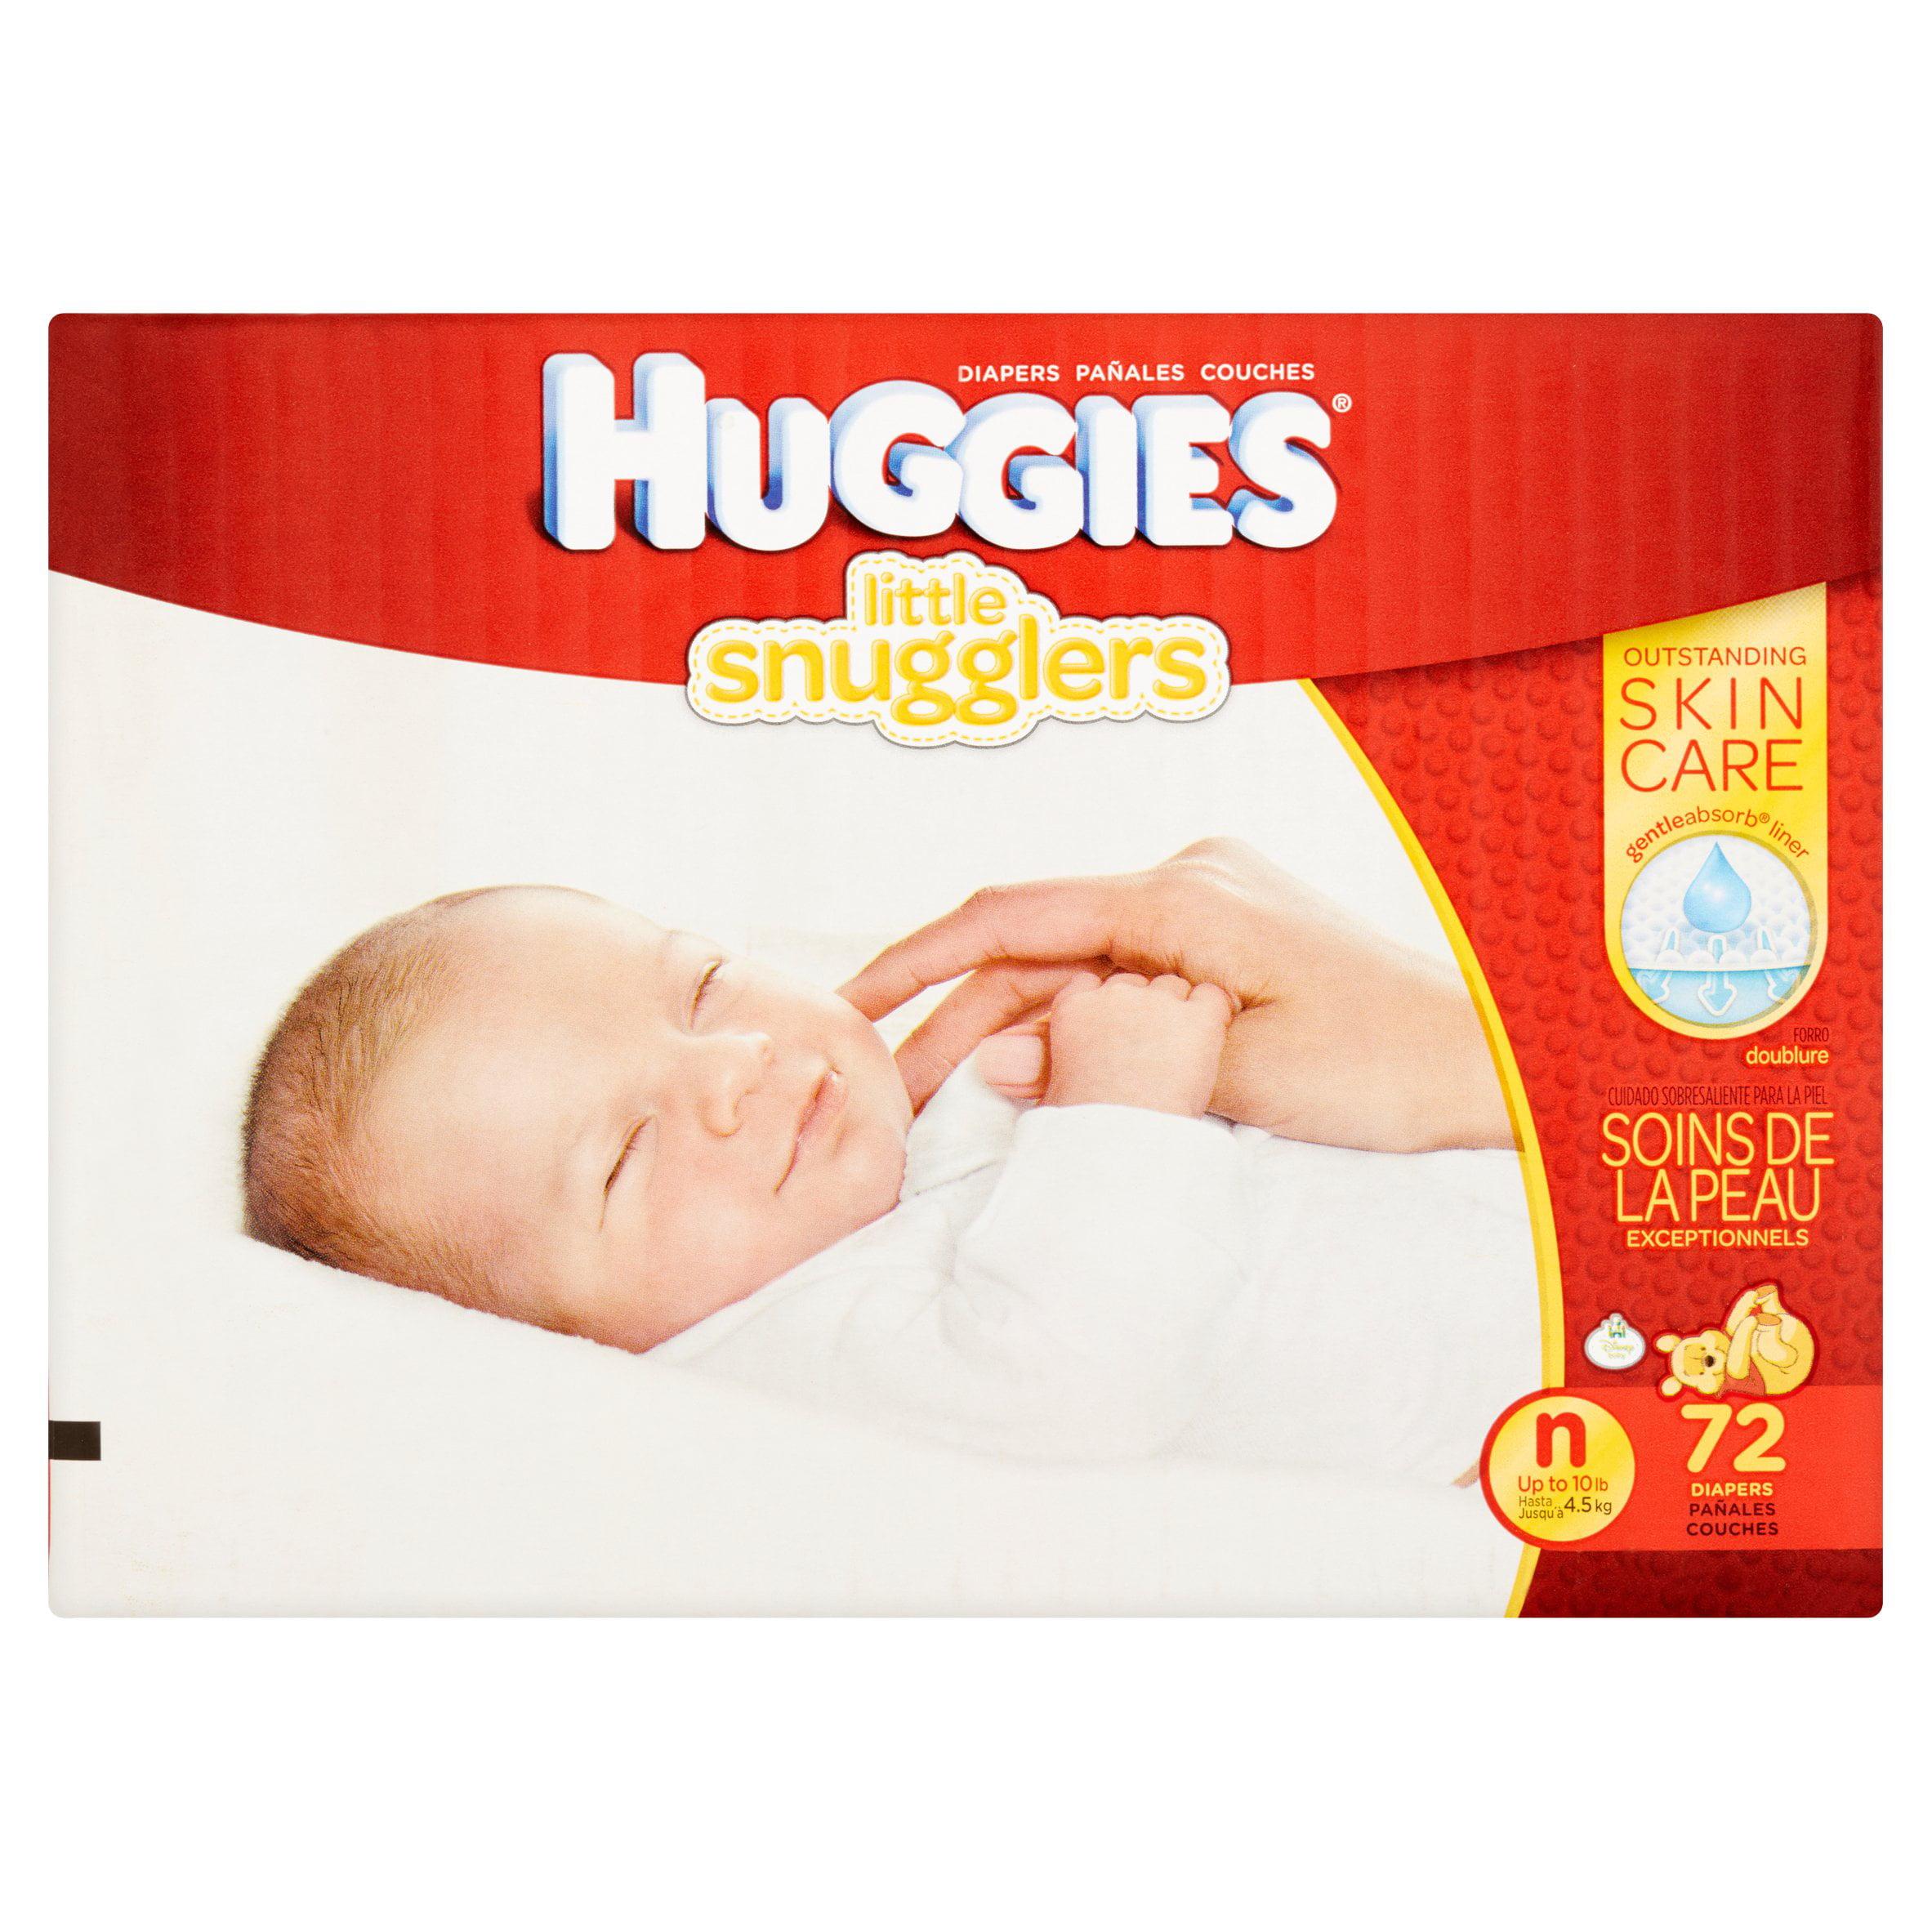 HUGGIES Little Snugglers Diapers, Newborn, 72 Diapers